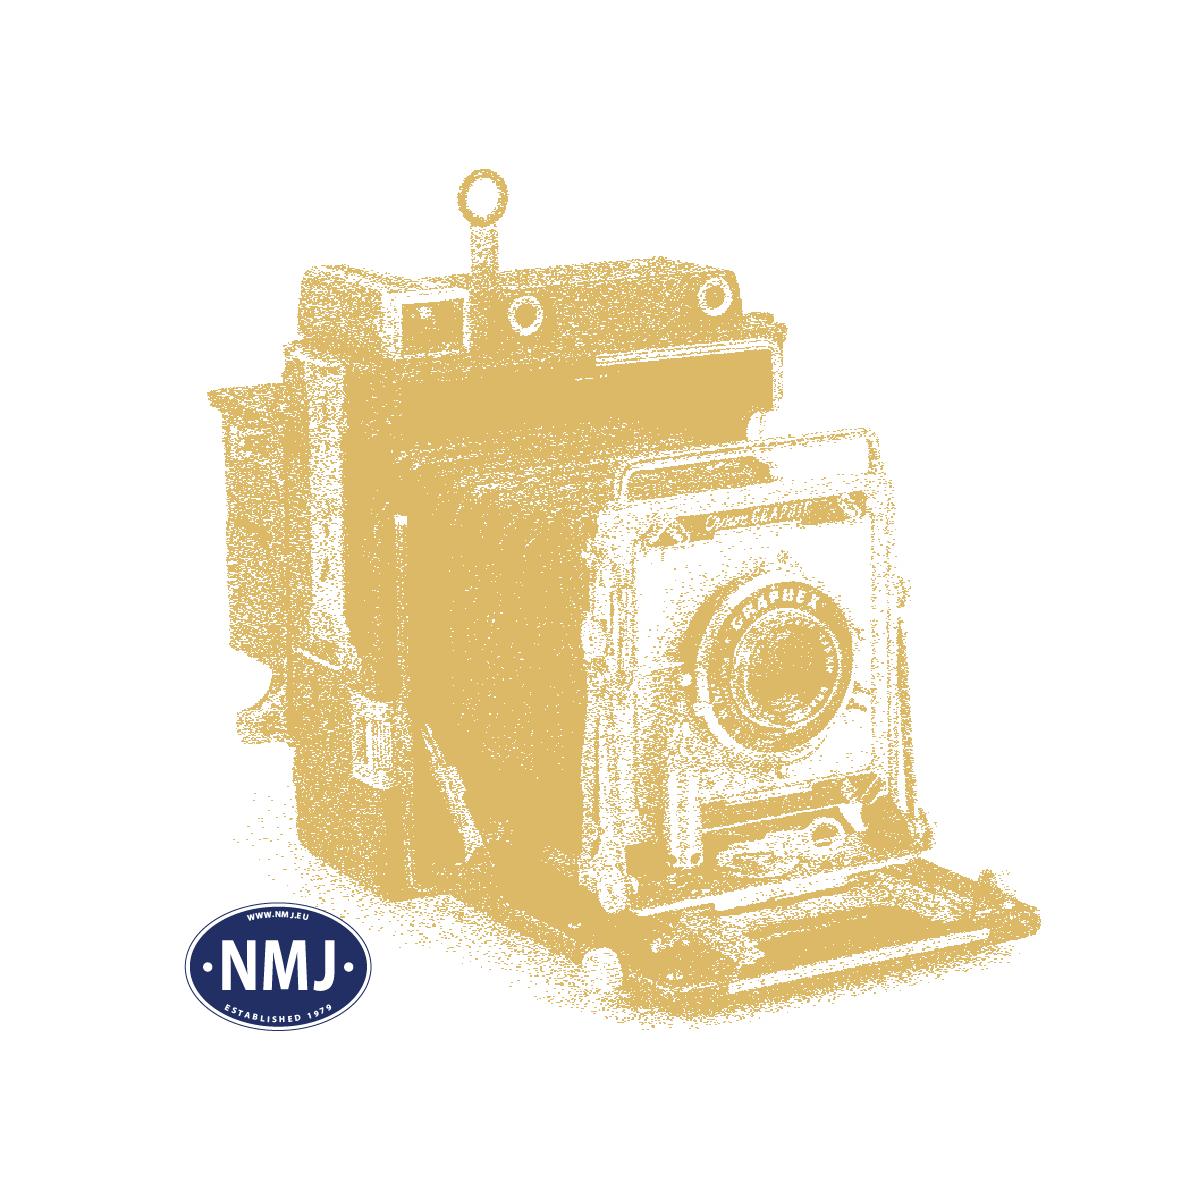 NMJT134.102 - NMJ Topline NSB DF37 21306, old design